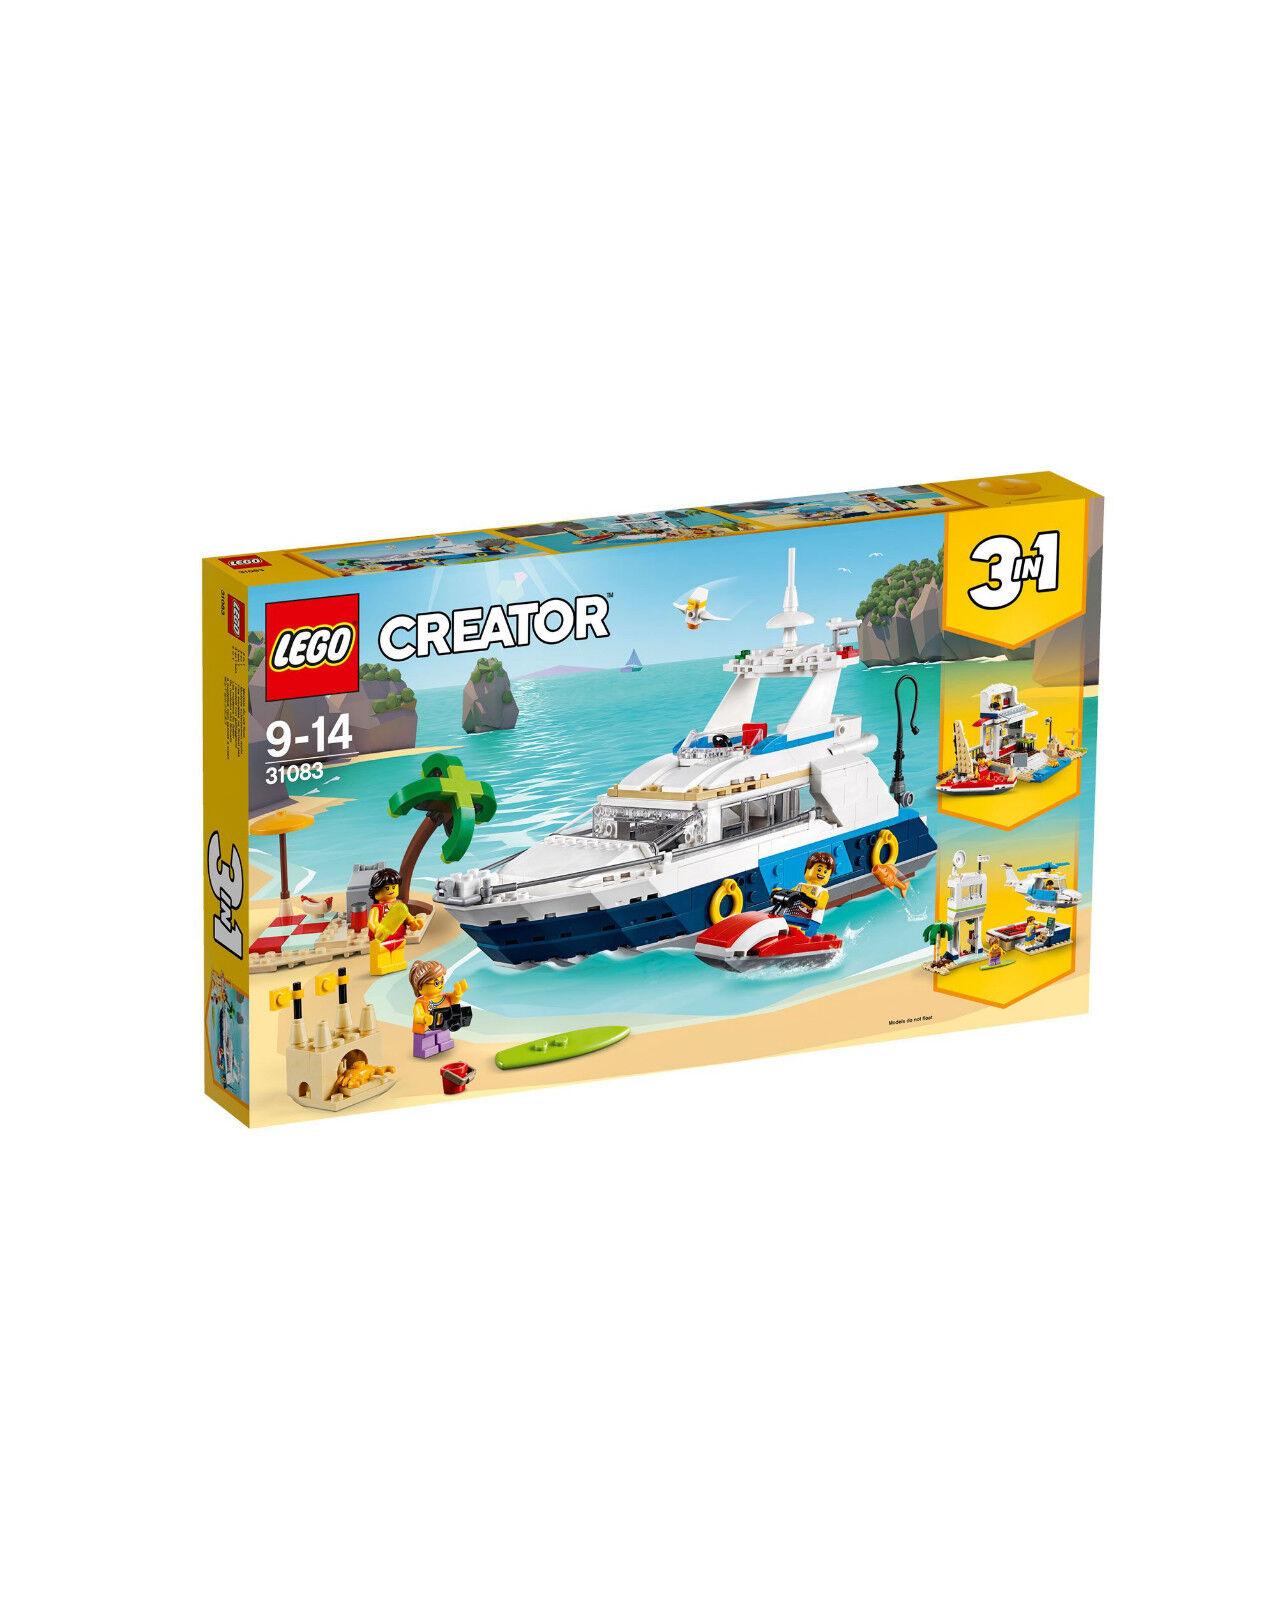 LEGO CREATOR 3 IN 1 YACHT  AVVENTURE IN MARE   9-14 ANNI    ART  31083